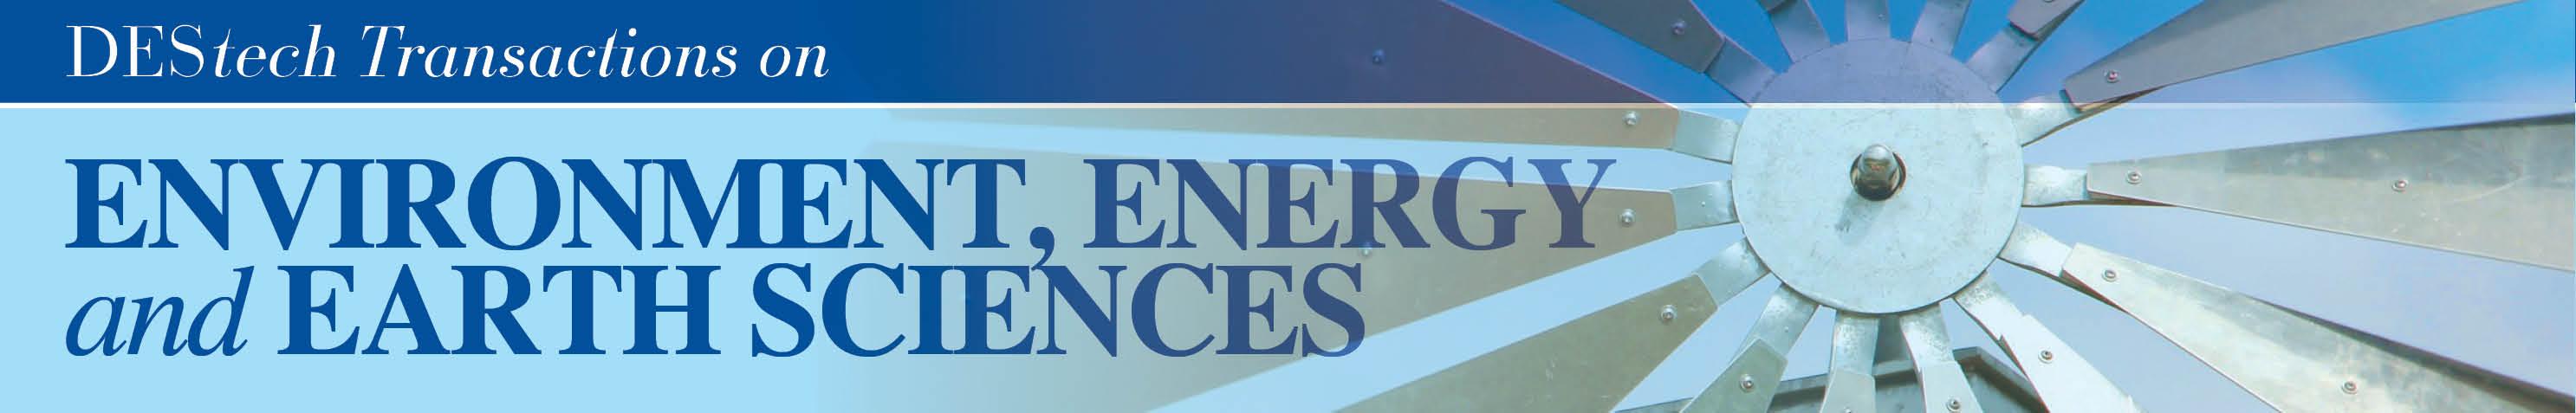 Masthead_environ_energy_earth_sci